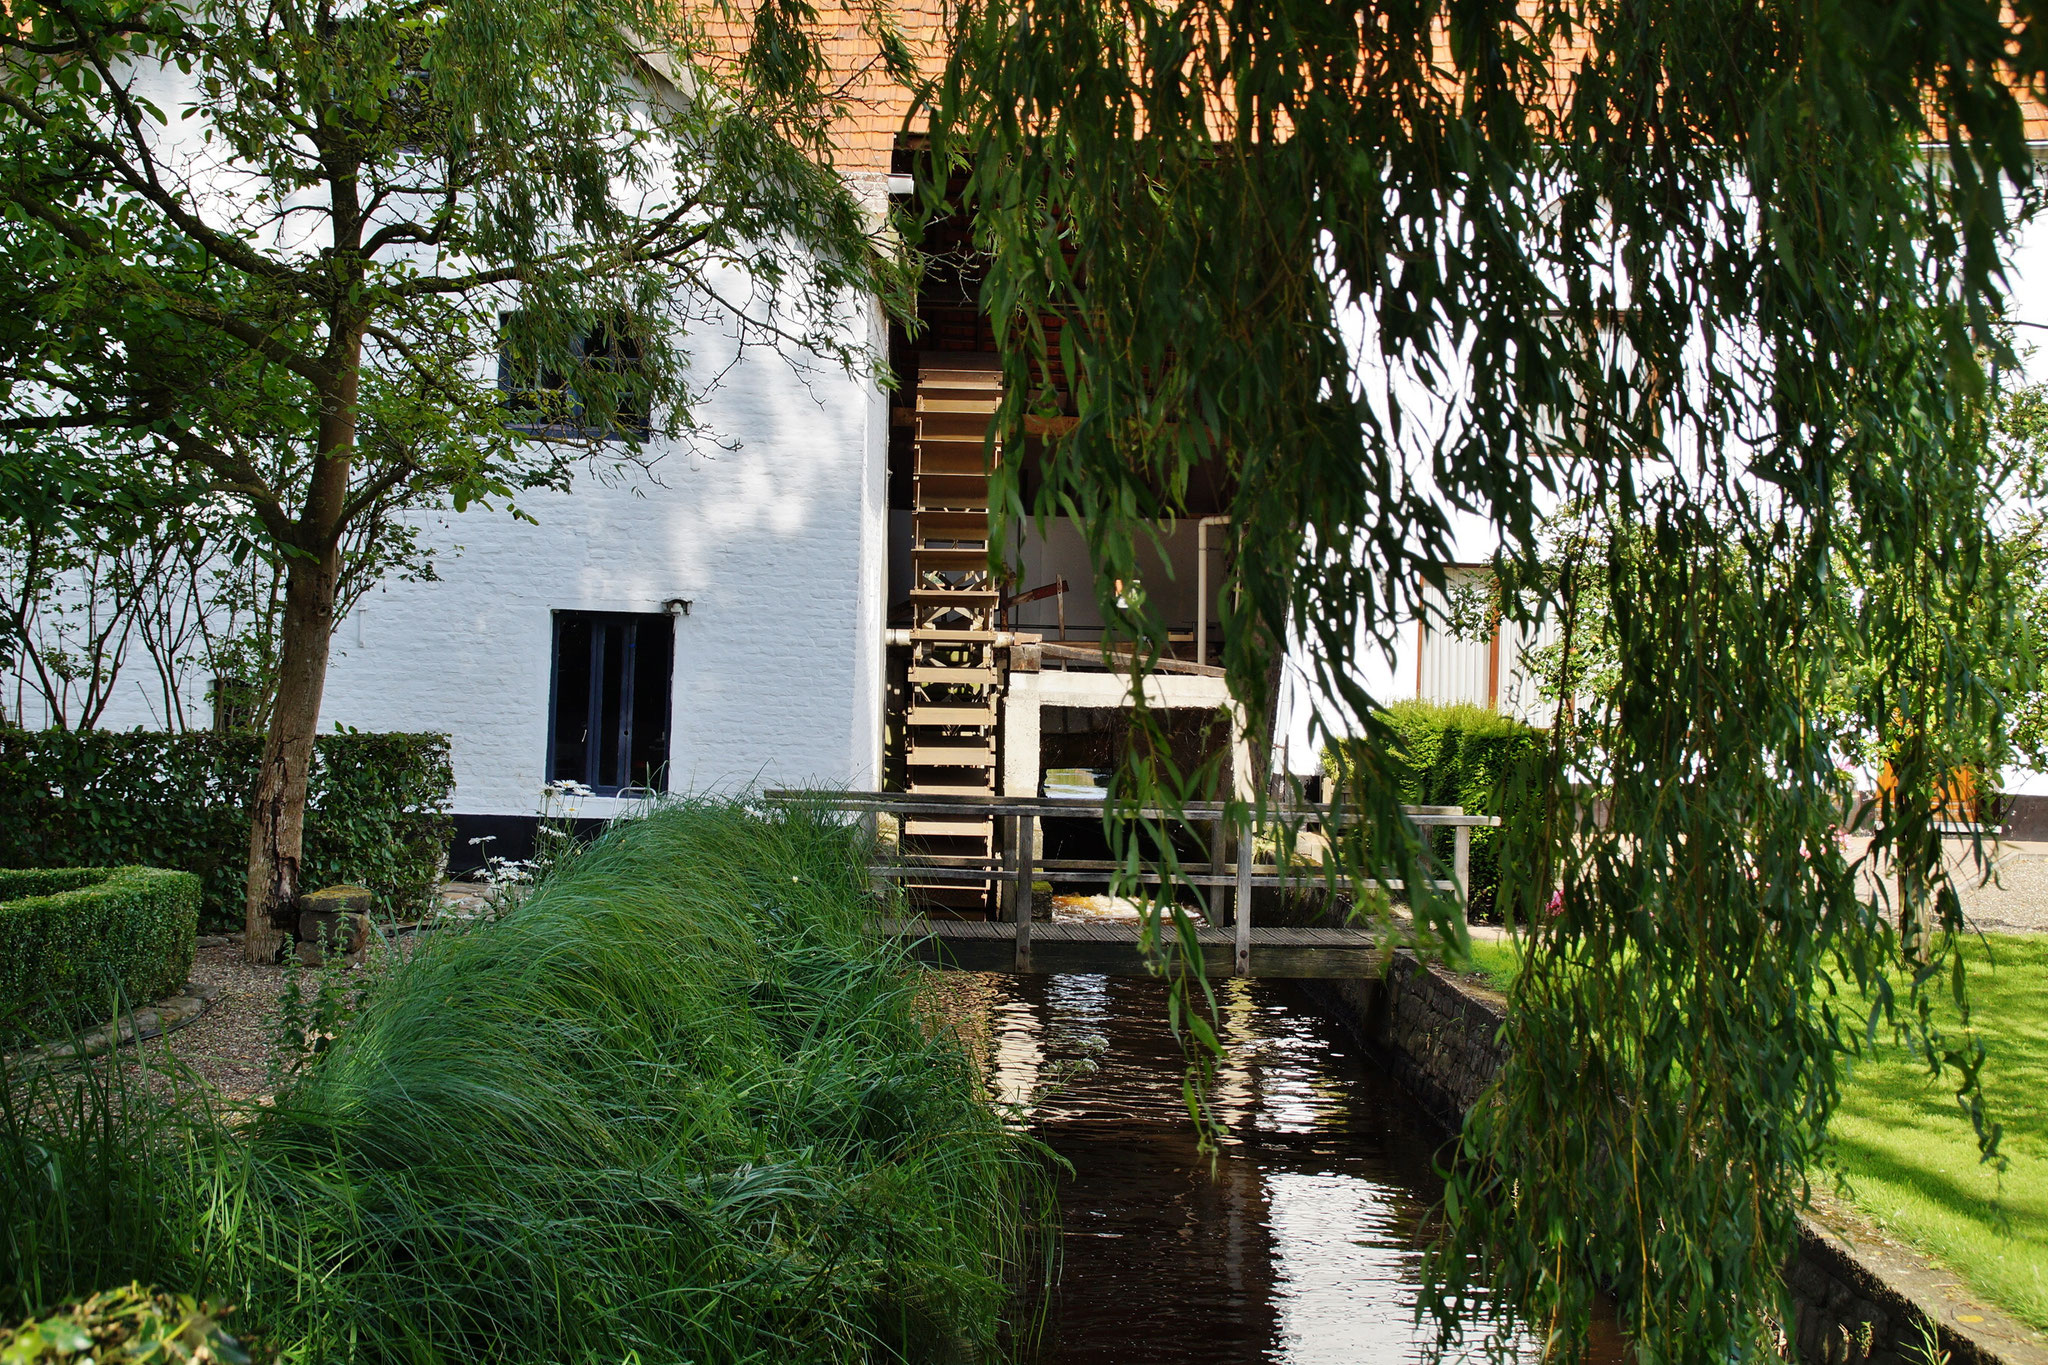 Wassermühle bei Wurfeld (B) bei Maaseik